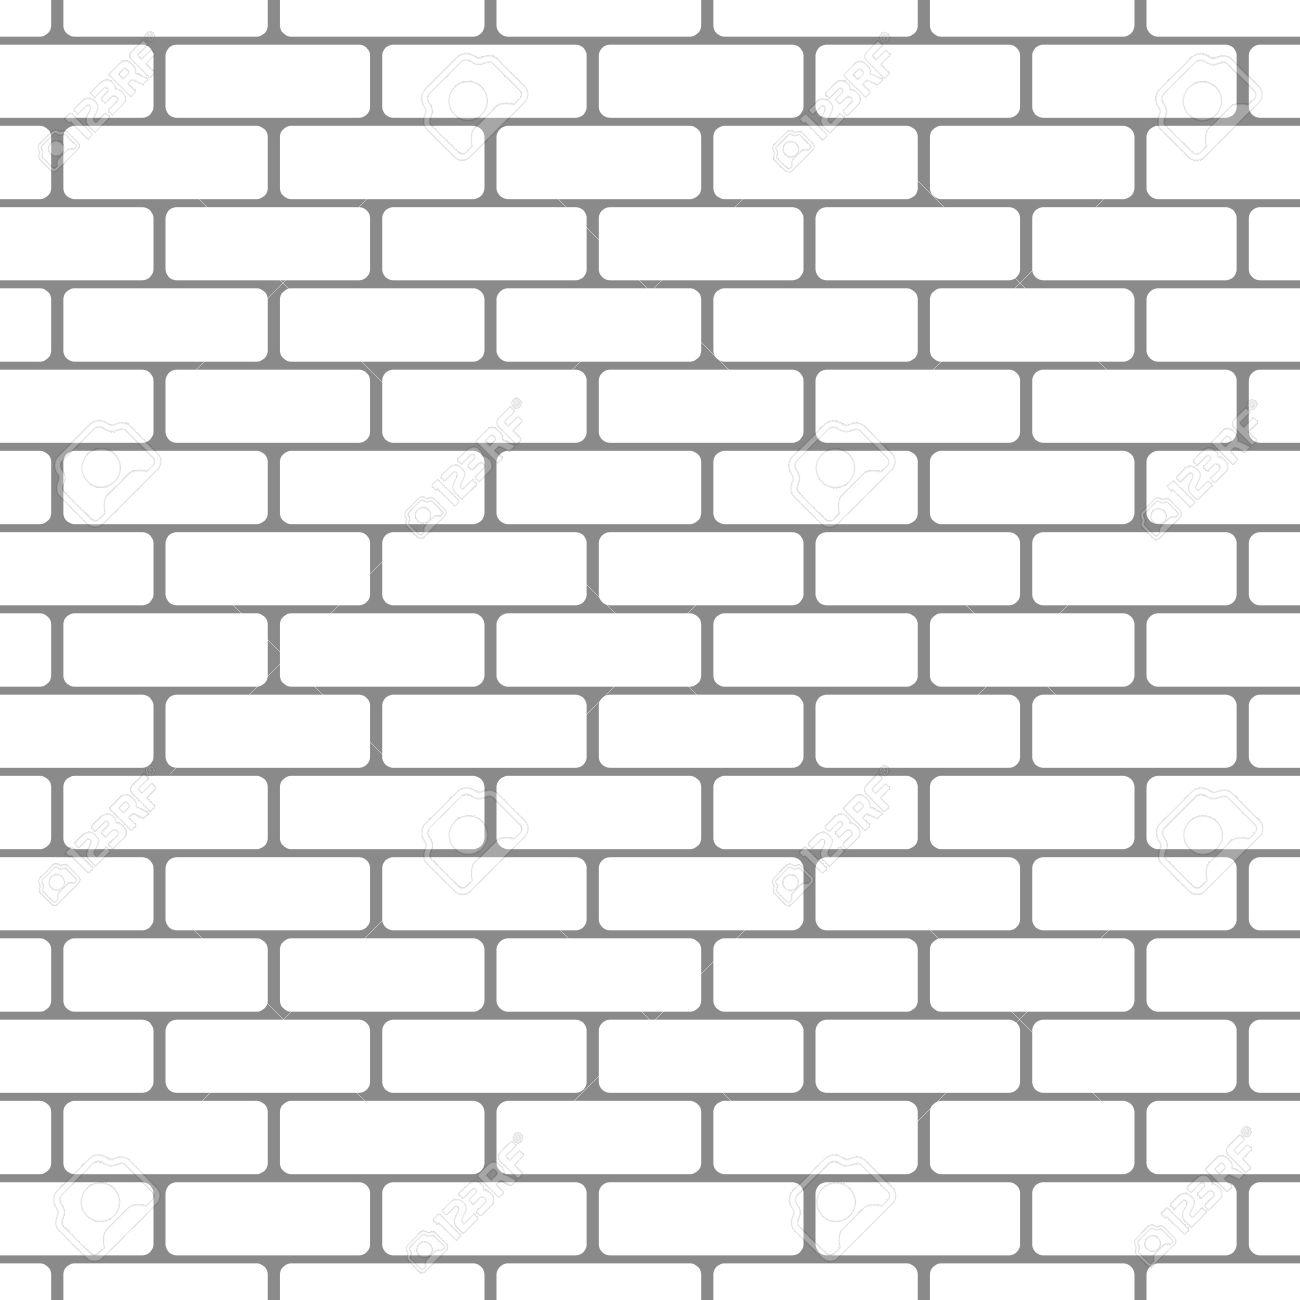 Free Brick Wall Cliparts, Download Free Clip Art, Free Clip Art on.